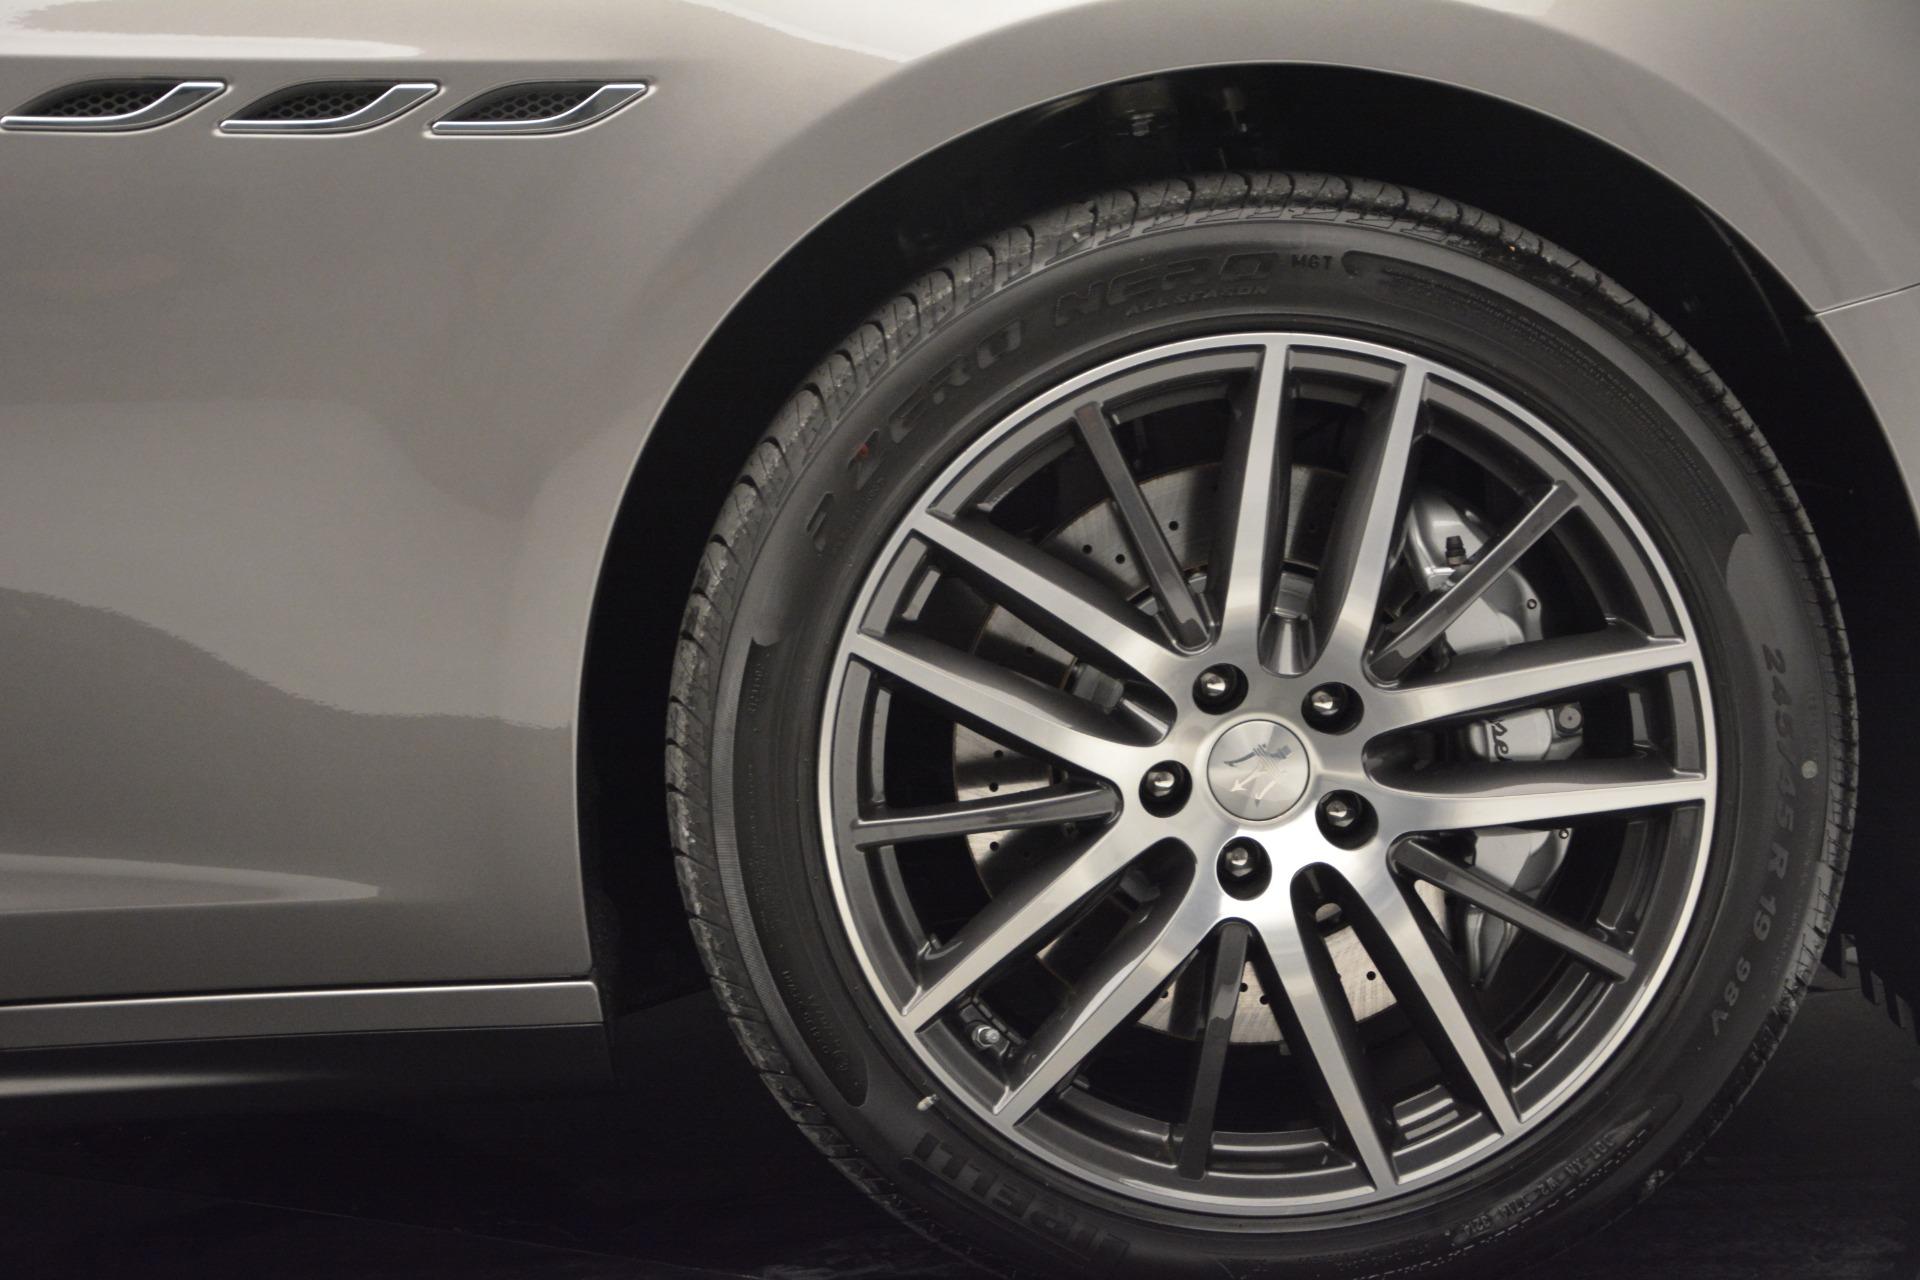 Used 2017 Maserati Ghibli S Q4 EX-LOANER For Sale In Greenwich, CT 608_p13